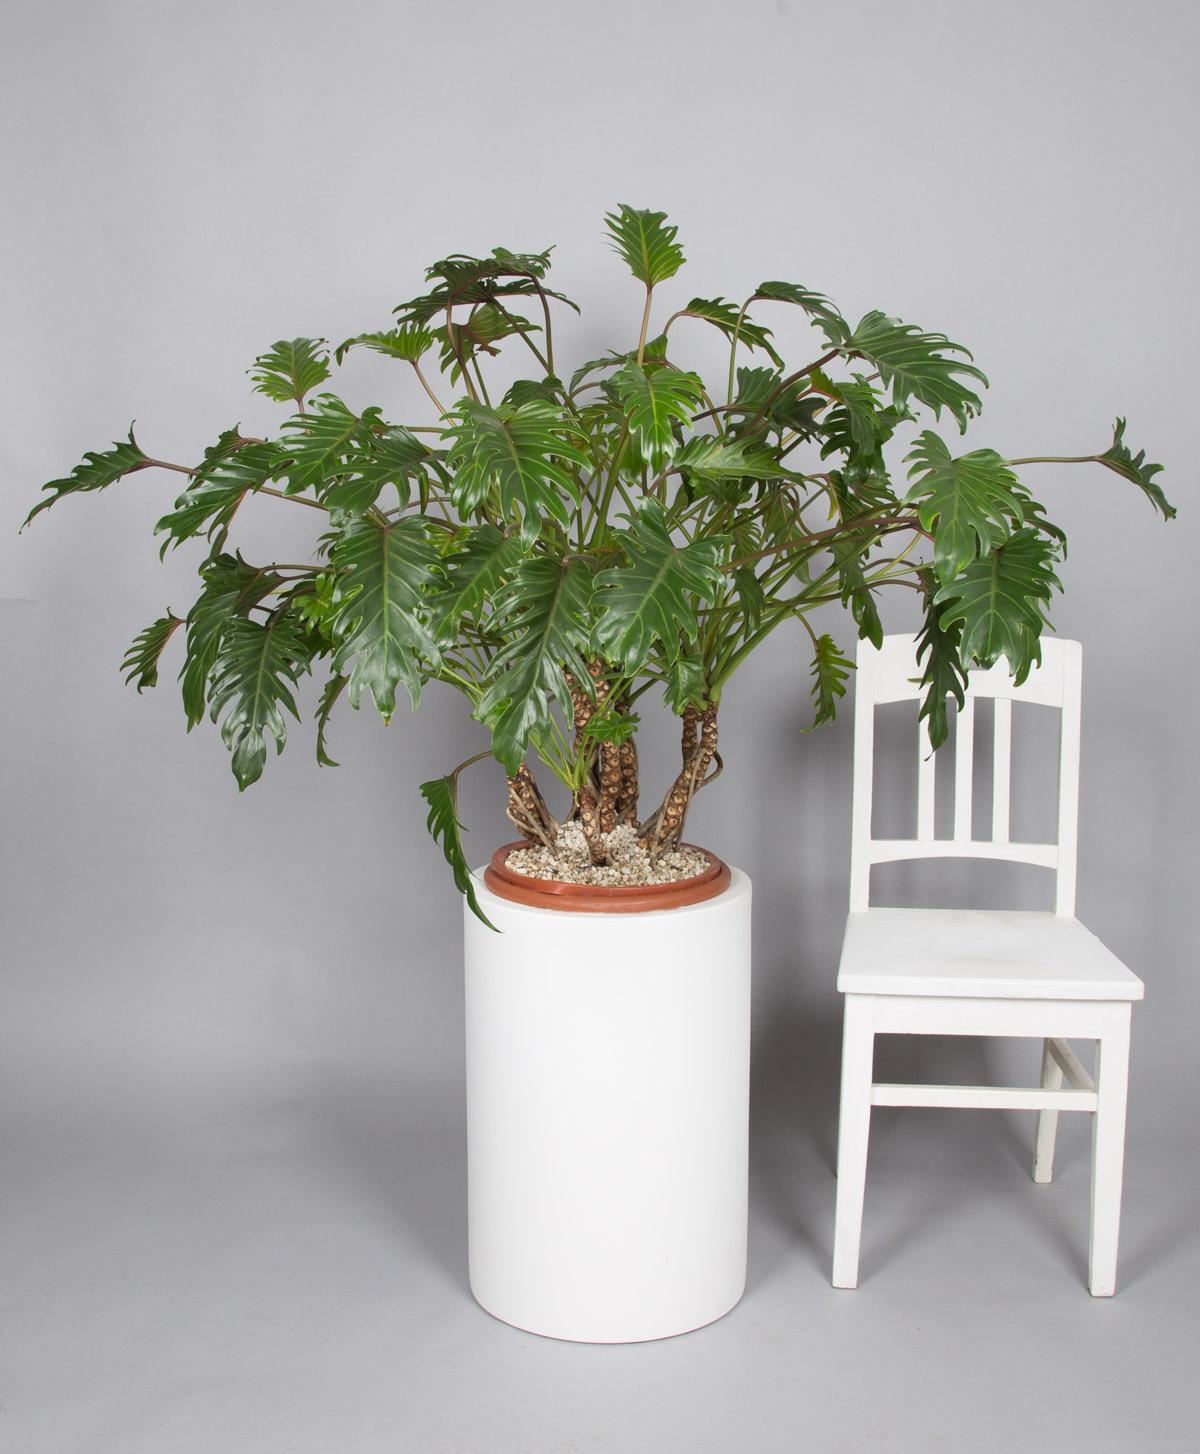 philodendron xanadu online kaufen bei 2bloom 2bloom. Black Bedroom Furniture Sets. Home Design Ideas